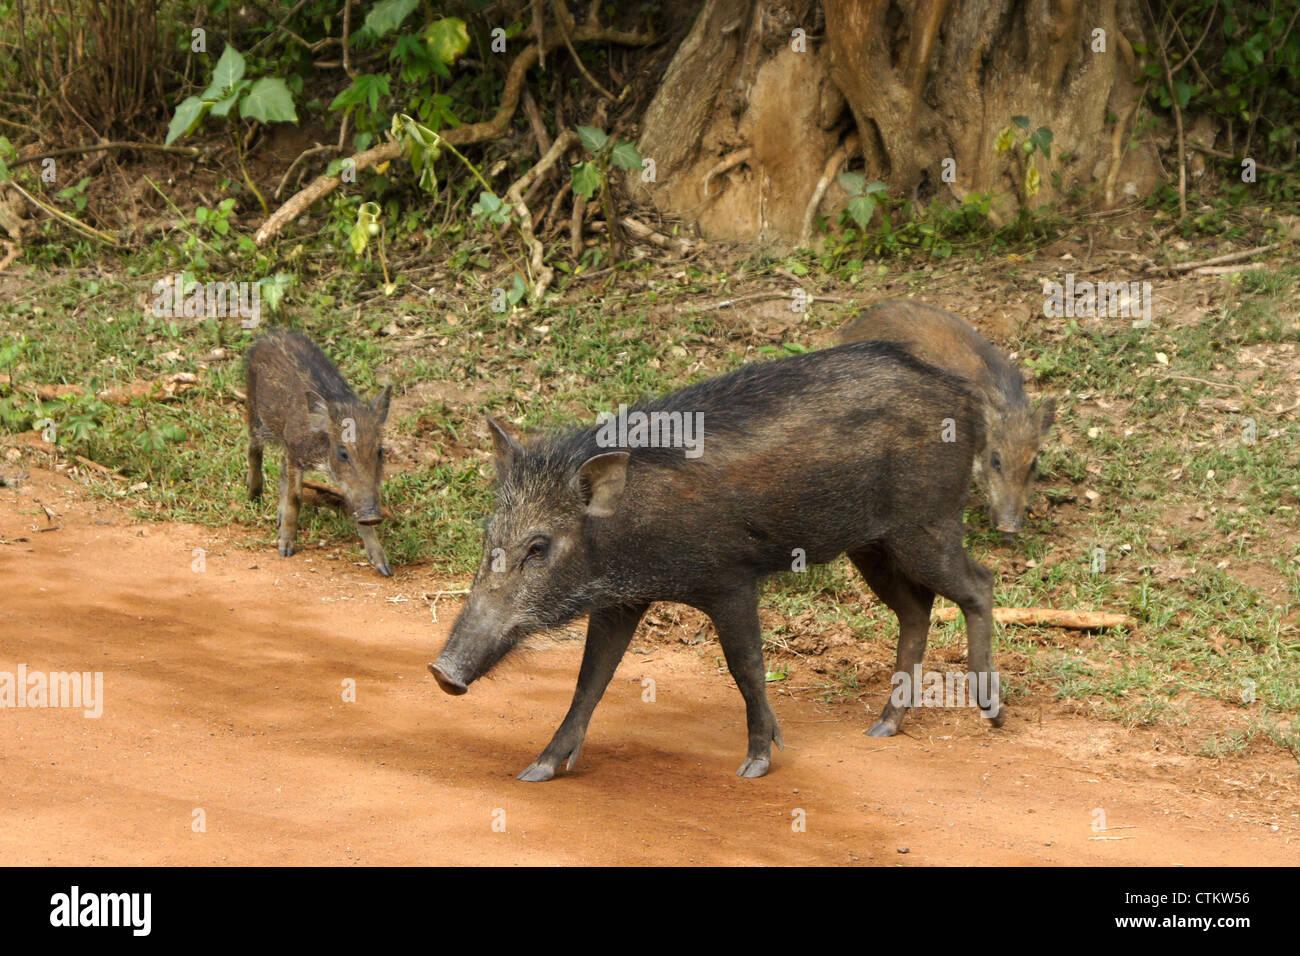 Wild boars on road, Yala National Park, Sri Lanka - Stock Image